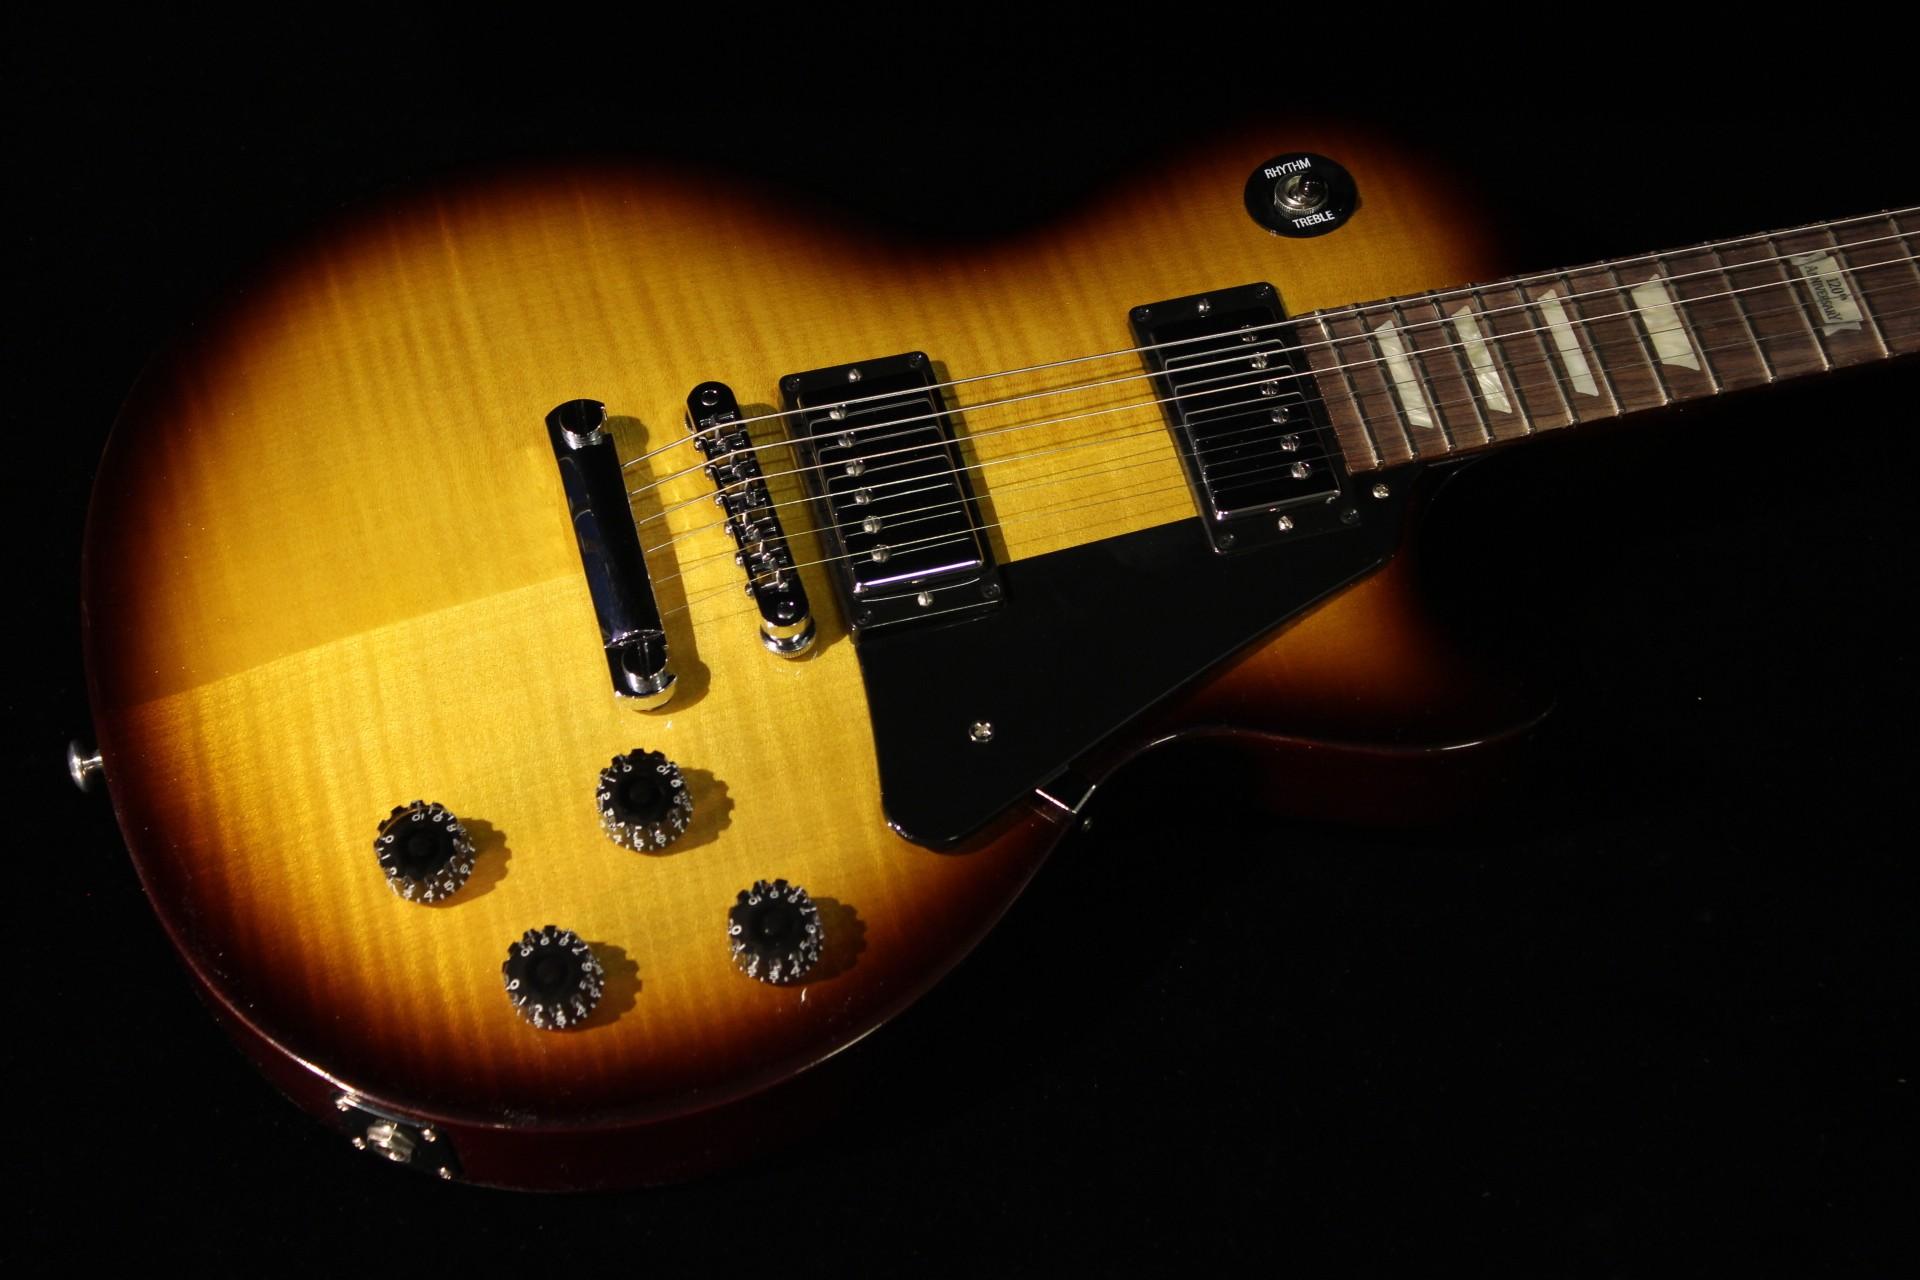 gibson les paul studio pro 2014 tobacco burst sn 140022411 gino guitars. Black Bedroom Furniture Sets. Home Design Ideas